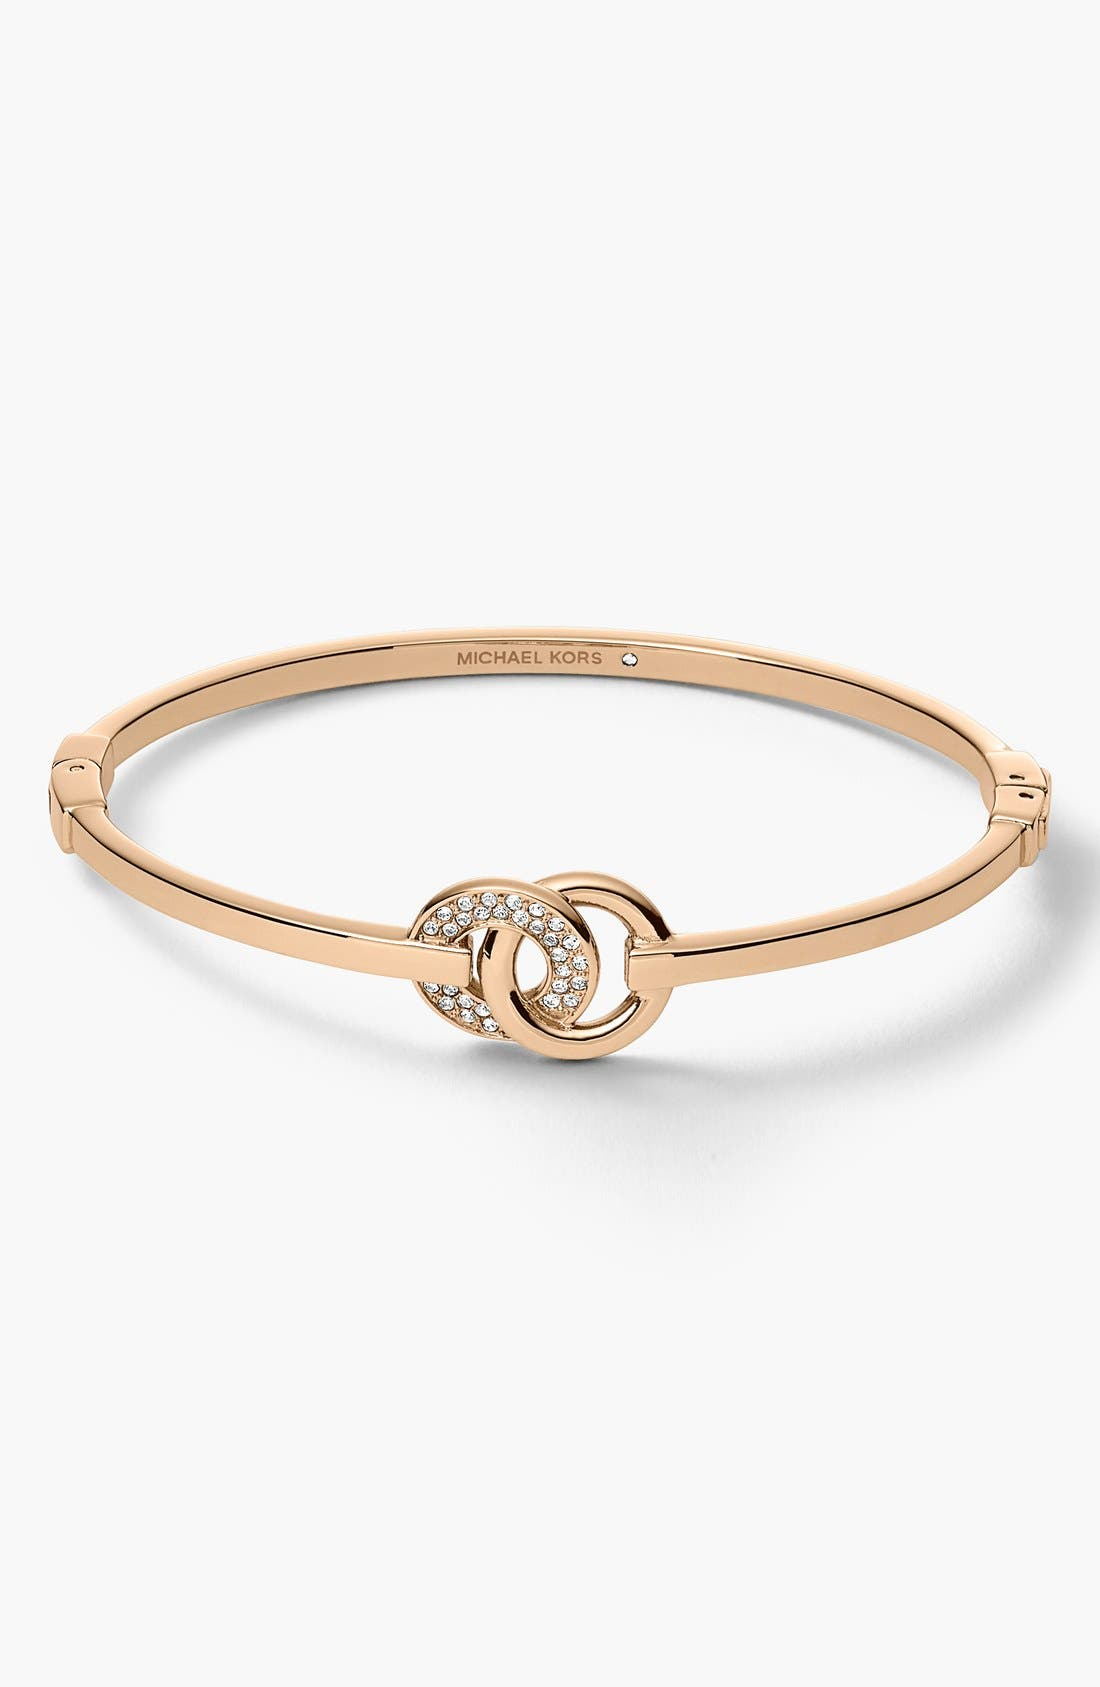 Alternate Image 1 Selected - Michael Kors 'Statement Brilliance' Double Ring Hinge Bangle